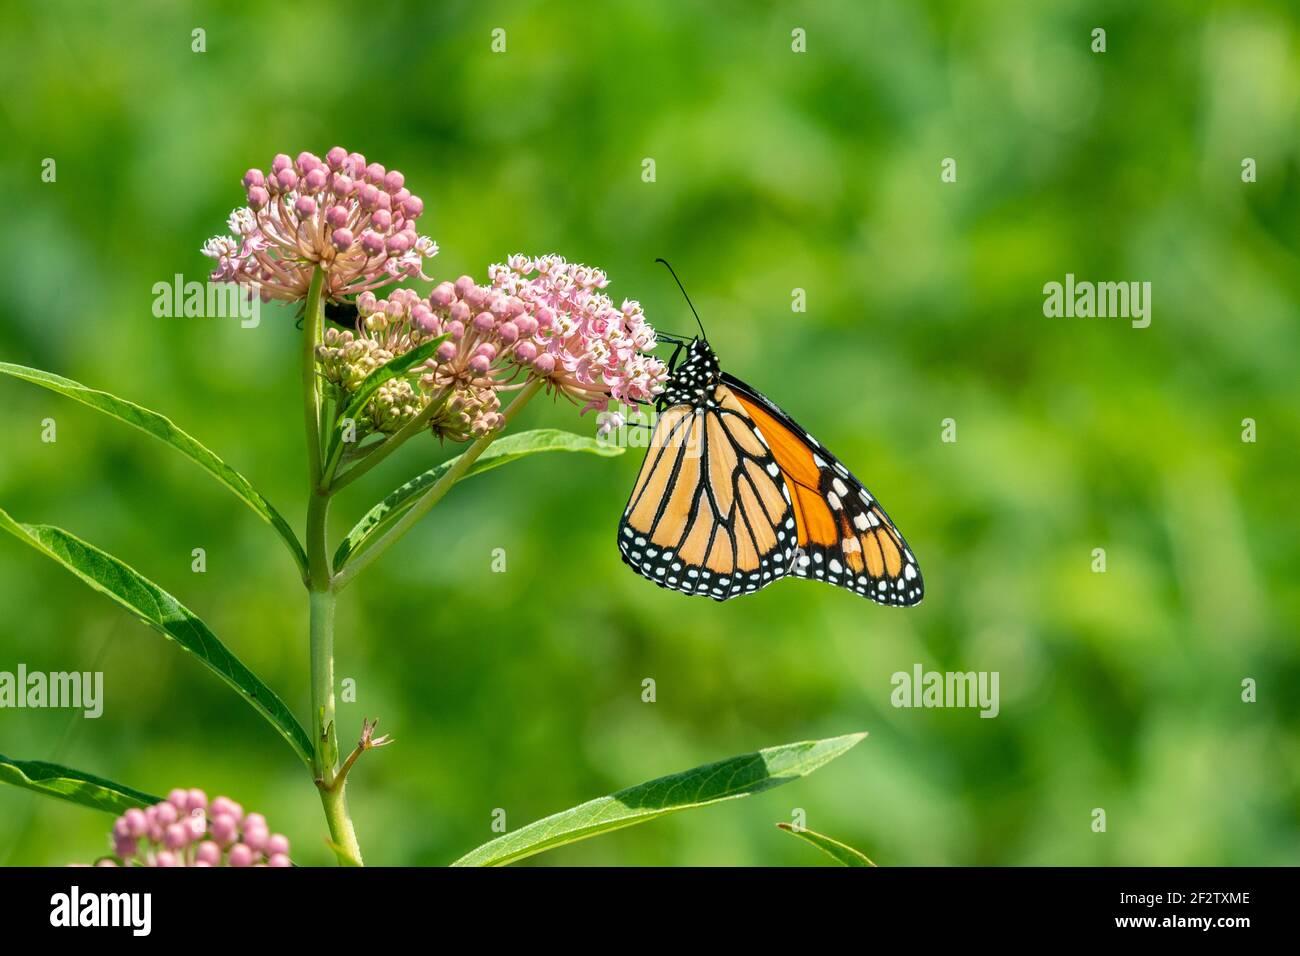 03536-06706 Monarca (Danaus plexippus) en Swamp Milkweed (Asclepias incarnata) Marion Co. IL Foto de stock